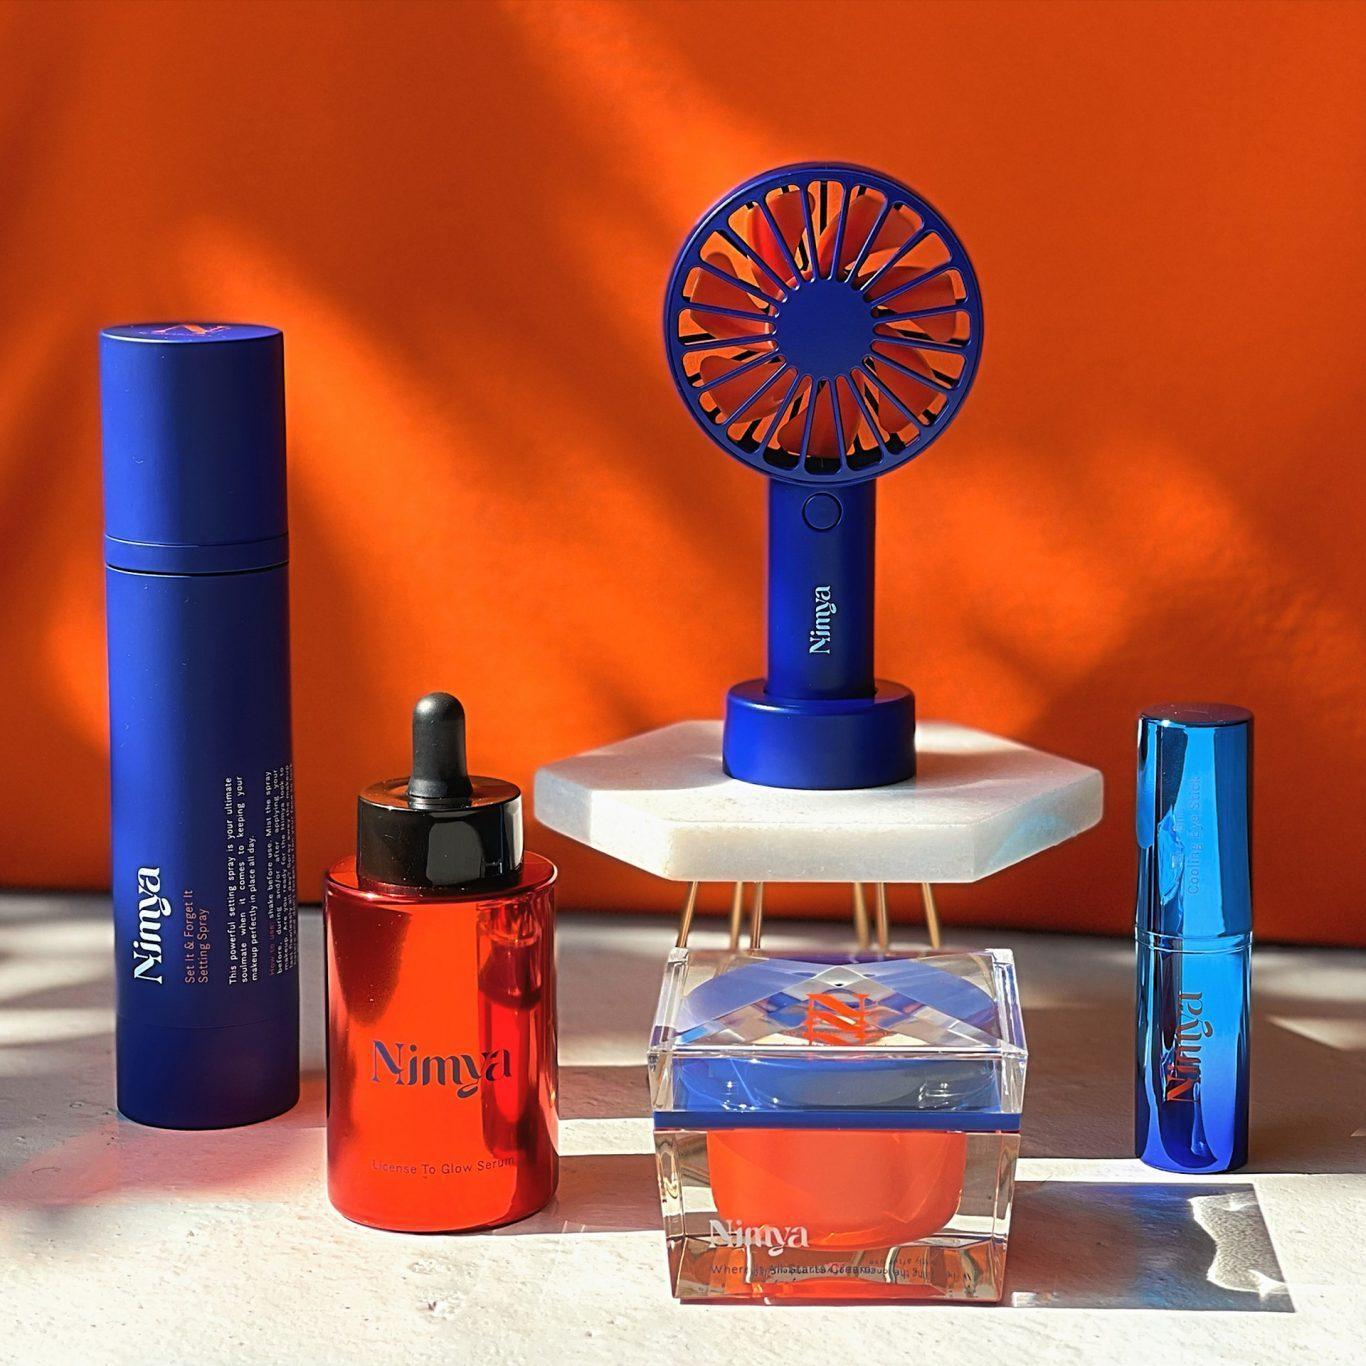 NikkieTutorials Nimya Beauty Brand Hello Nimya Bundle Cover